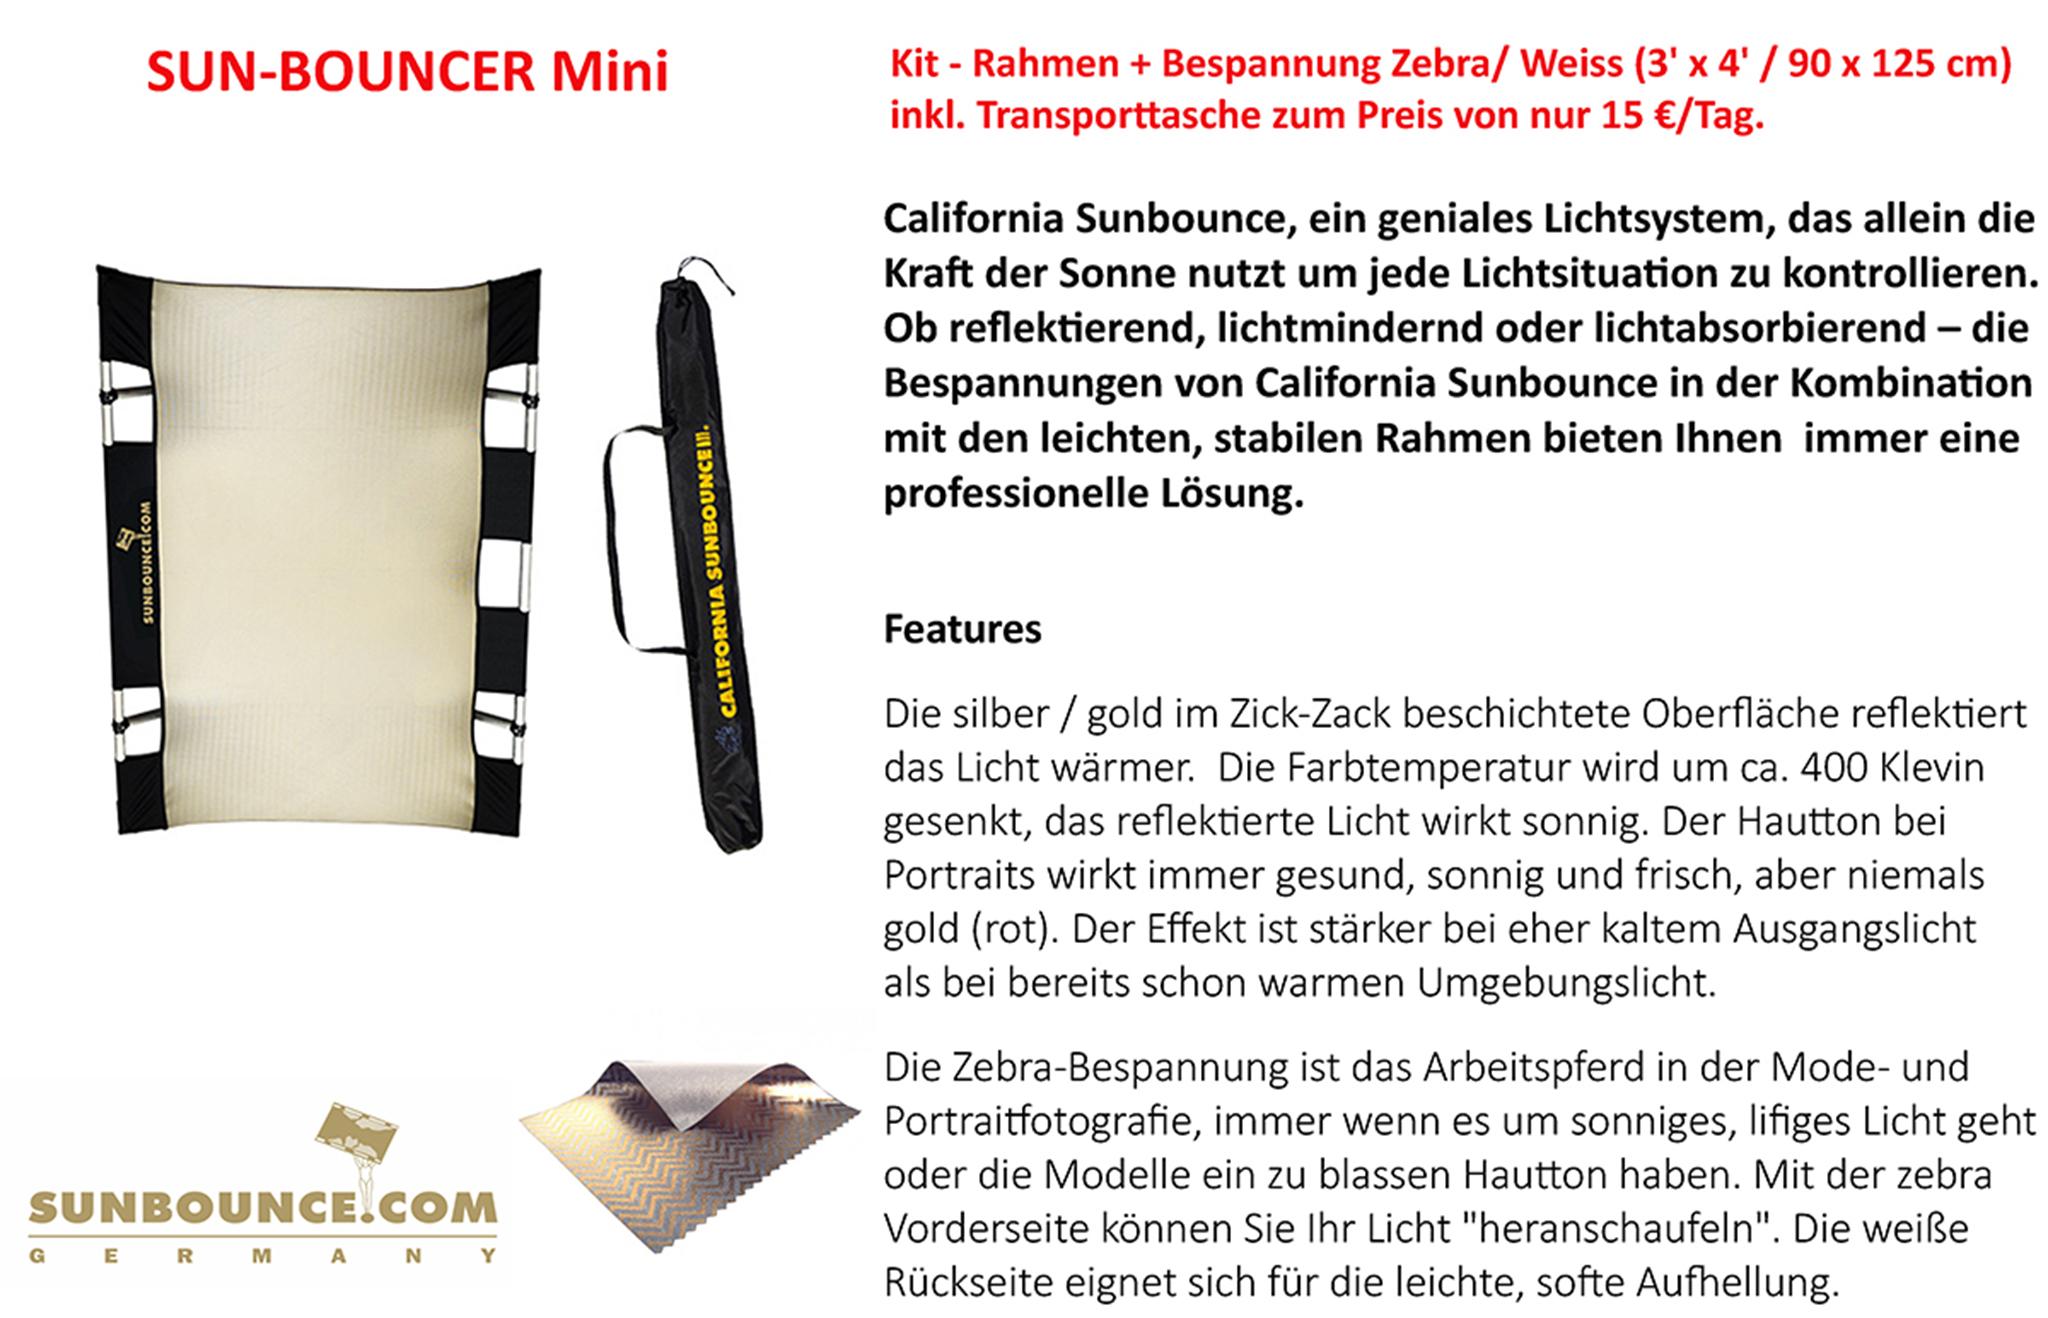 Sun-Bouncer Mini (Zebra/Weiss)